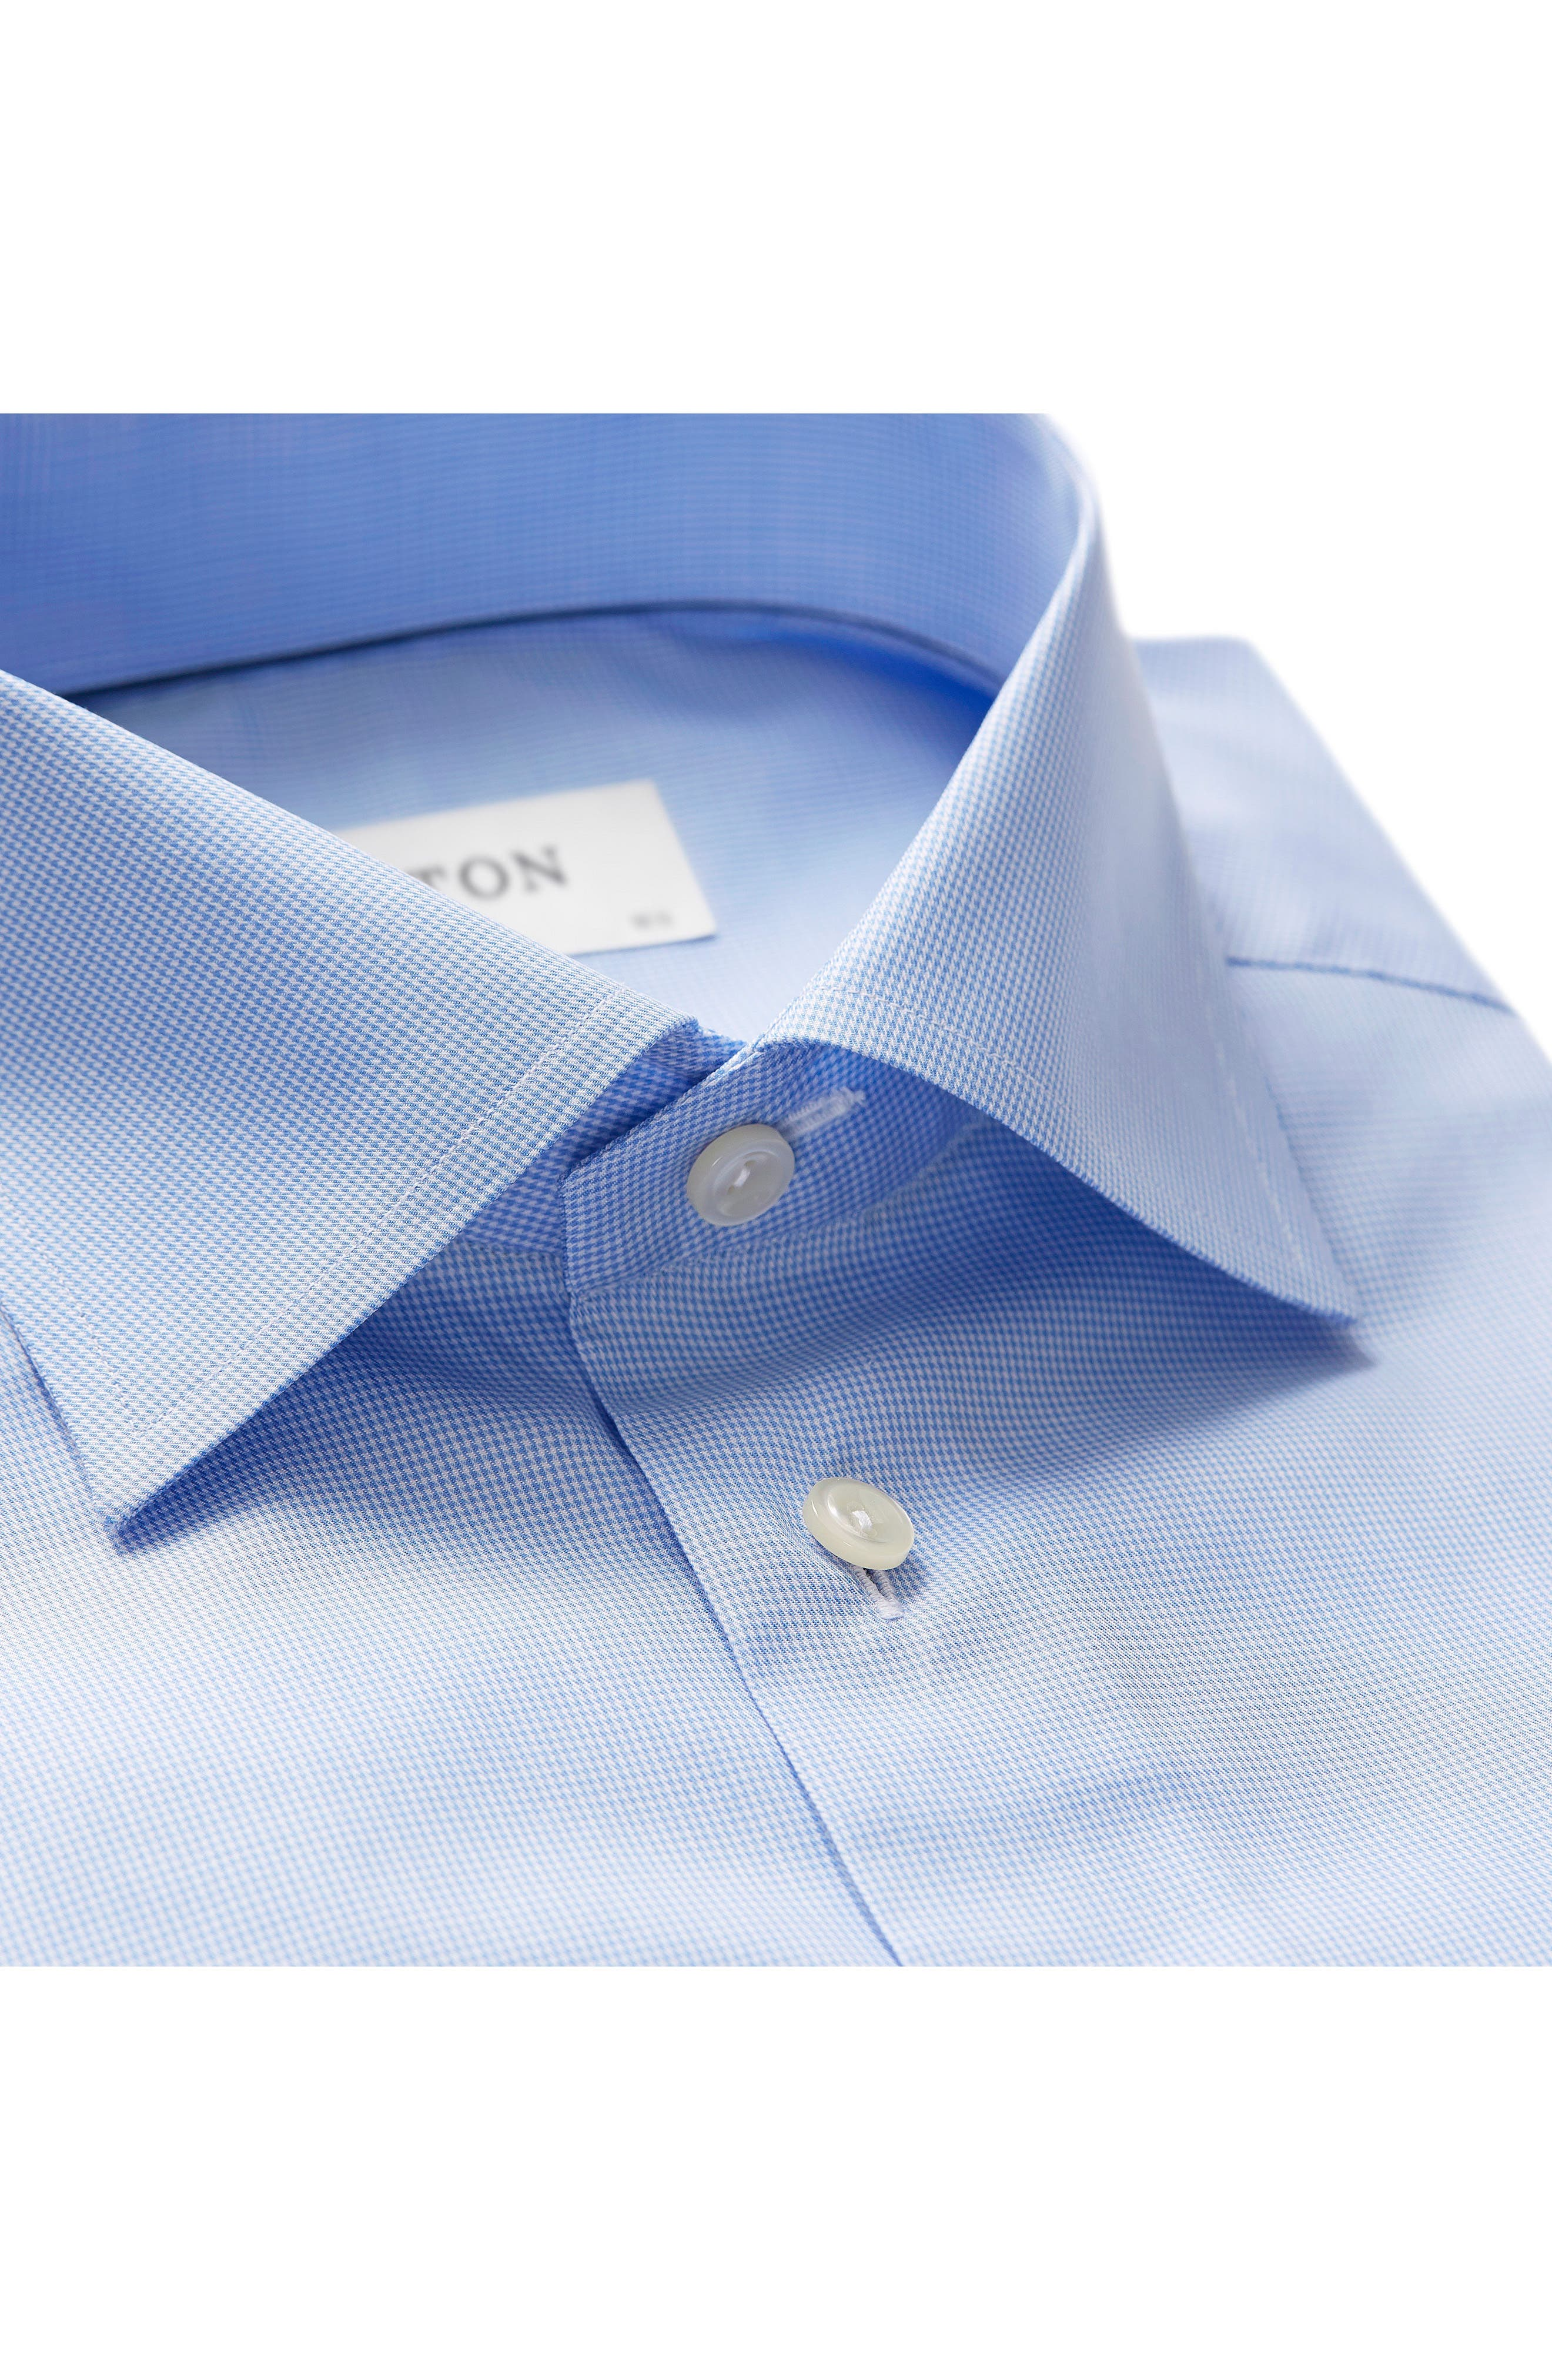 Slim Fit Houndstooth Dress Shirt,                             Alternate thumbnail 4, color,                             400